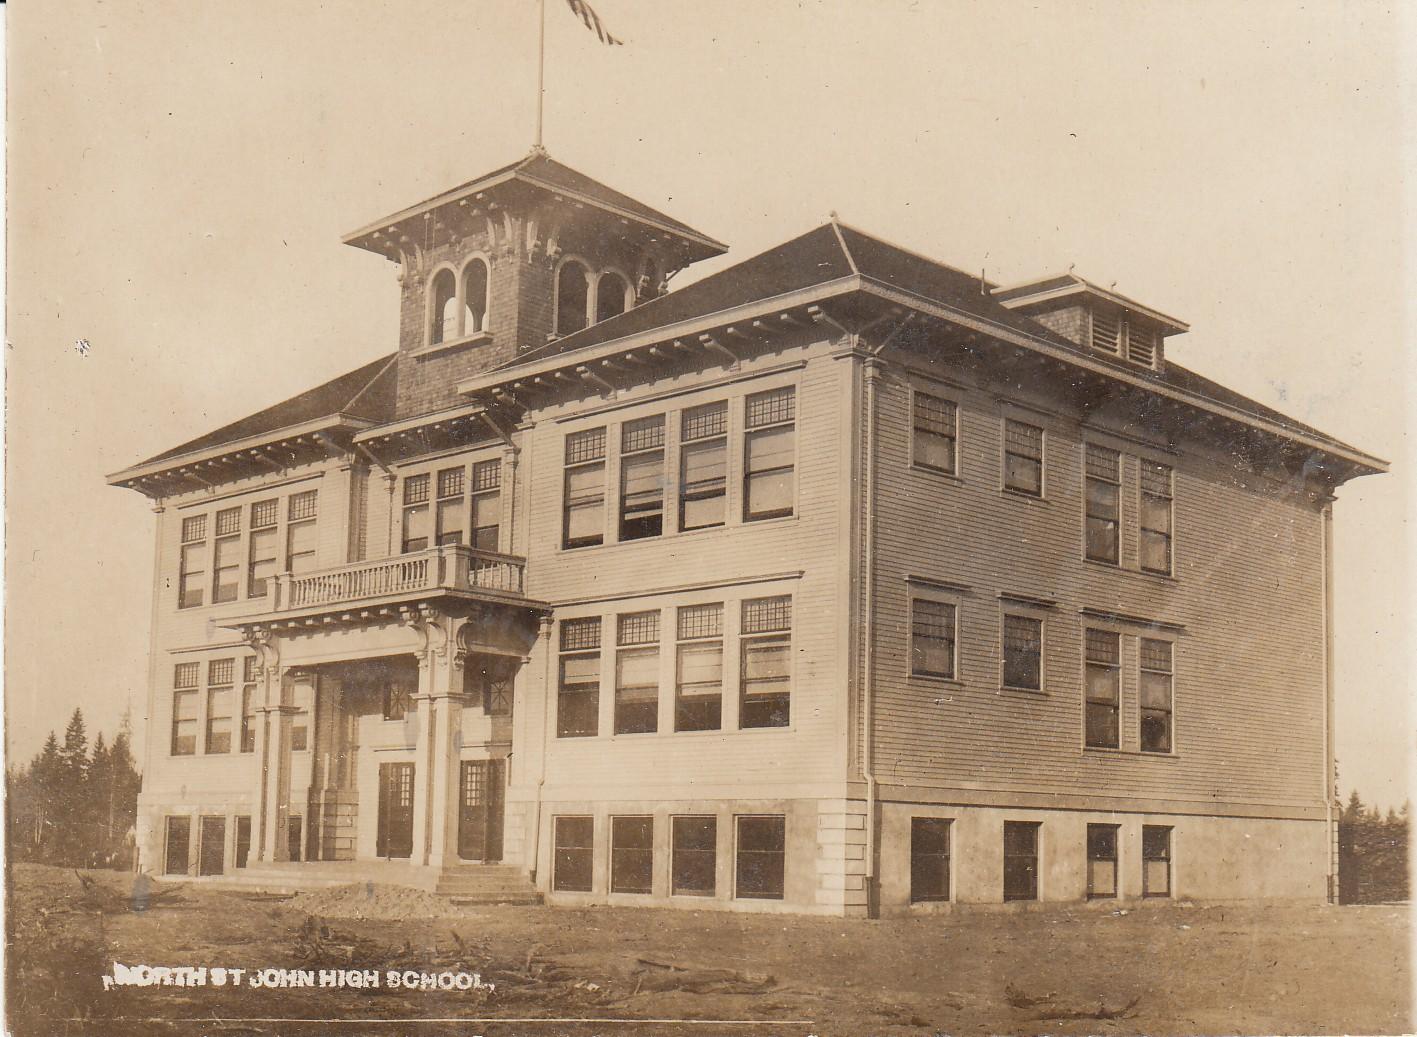 1907  New North school (Sitton)